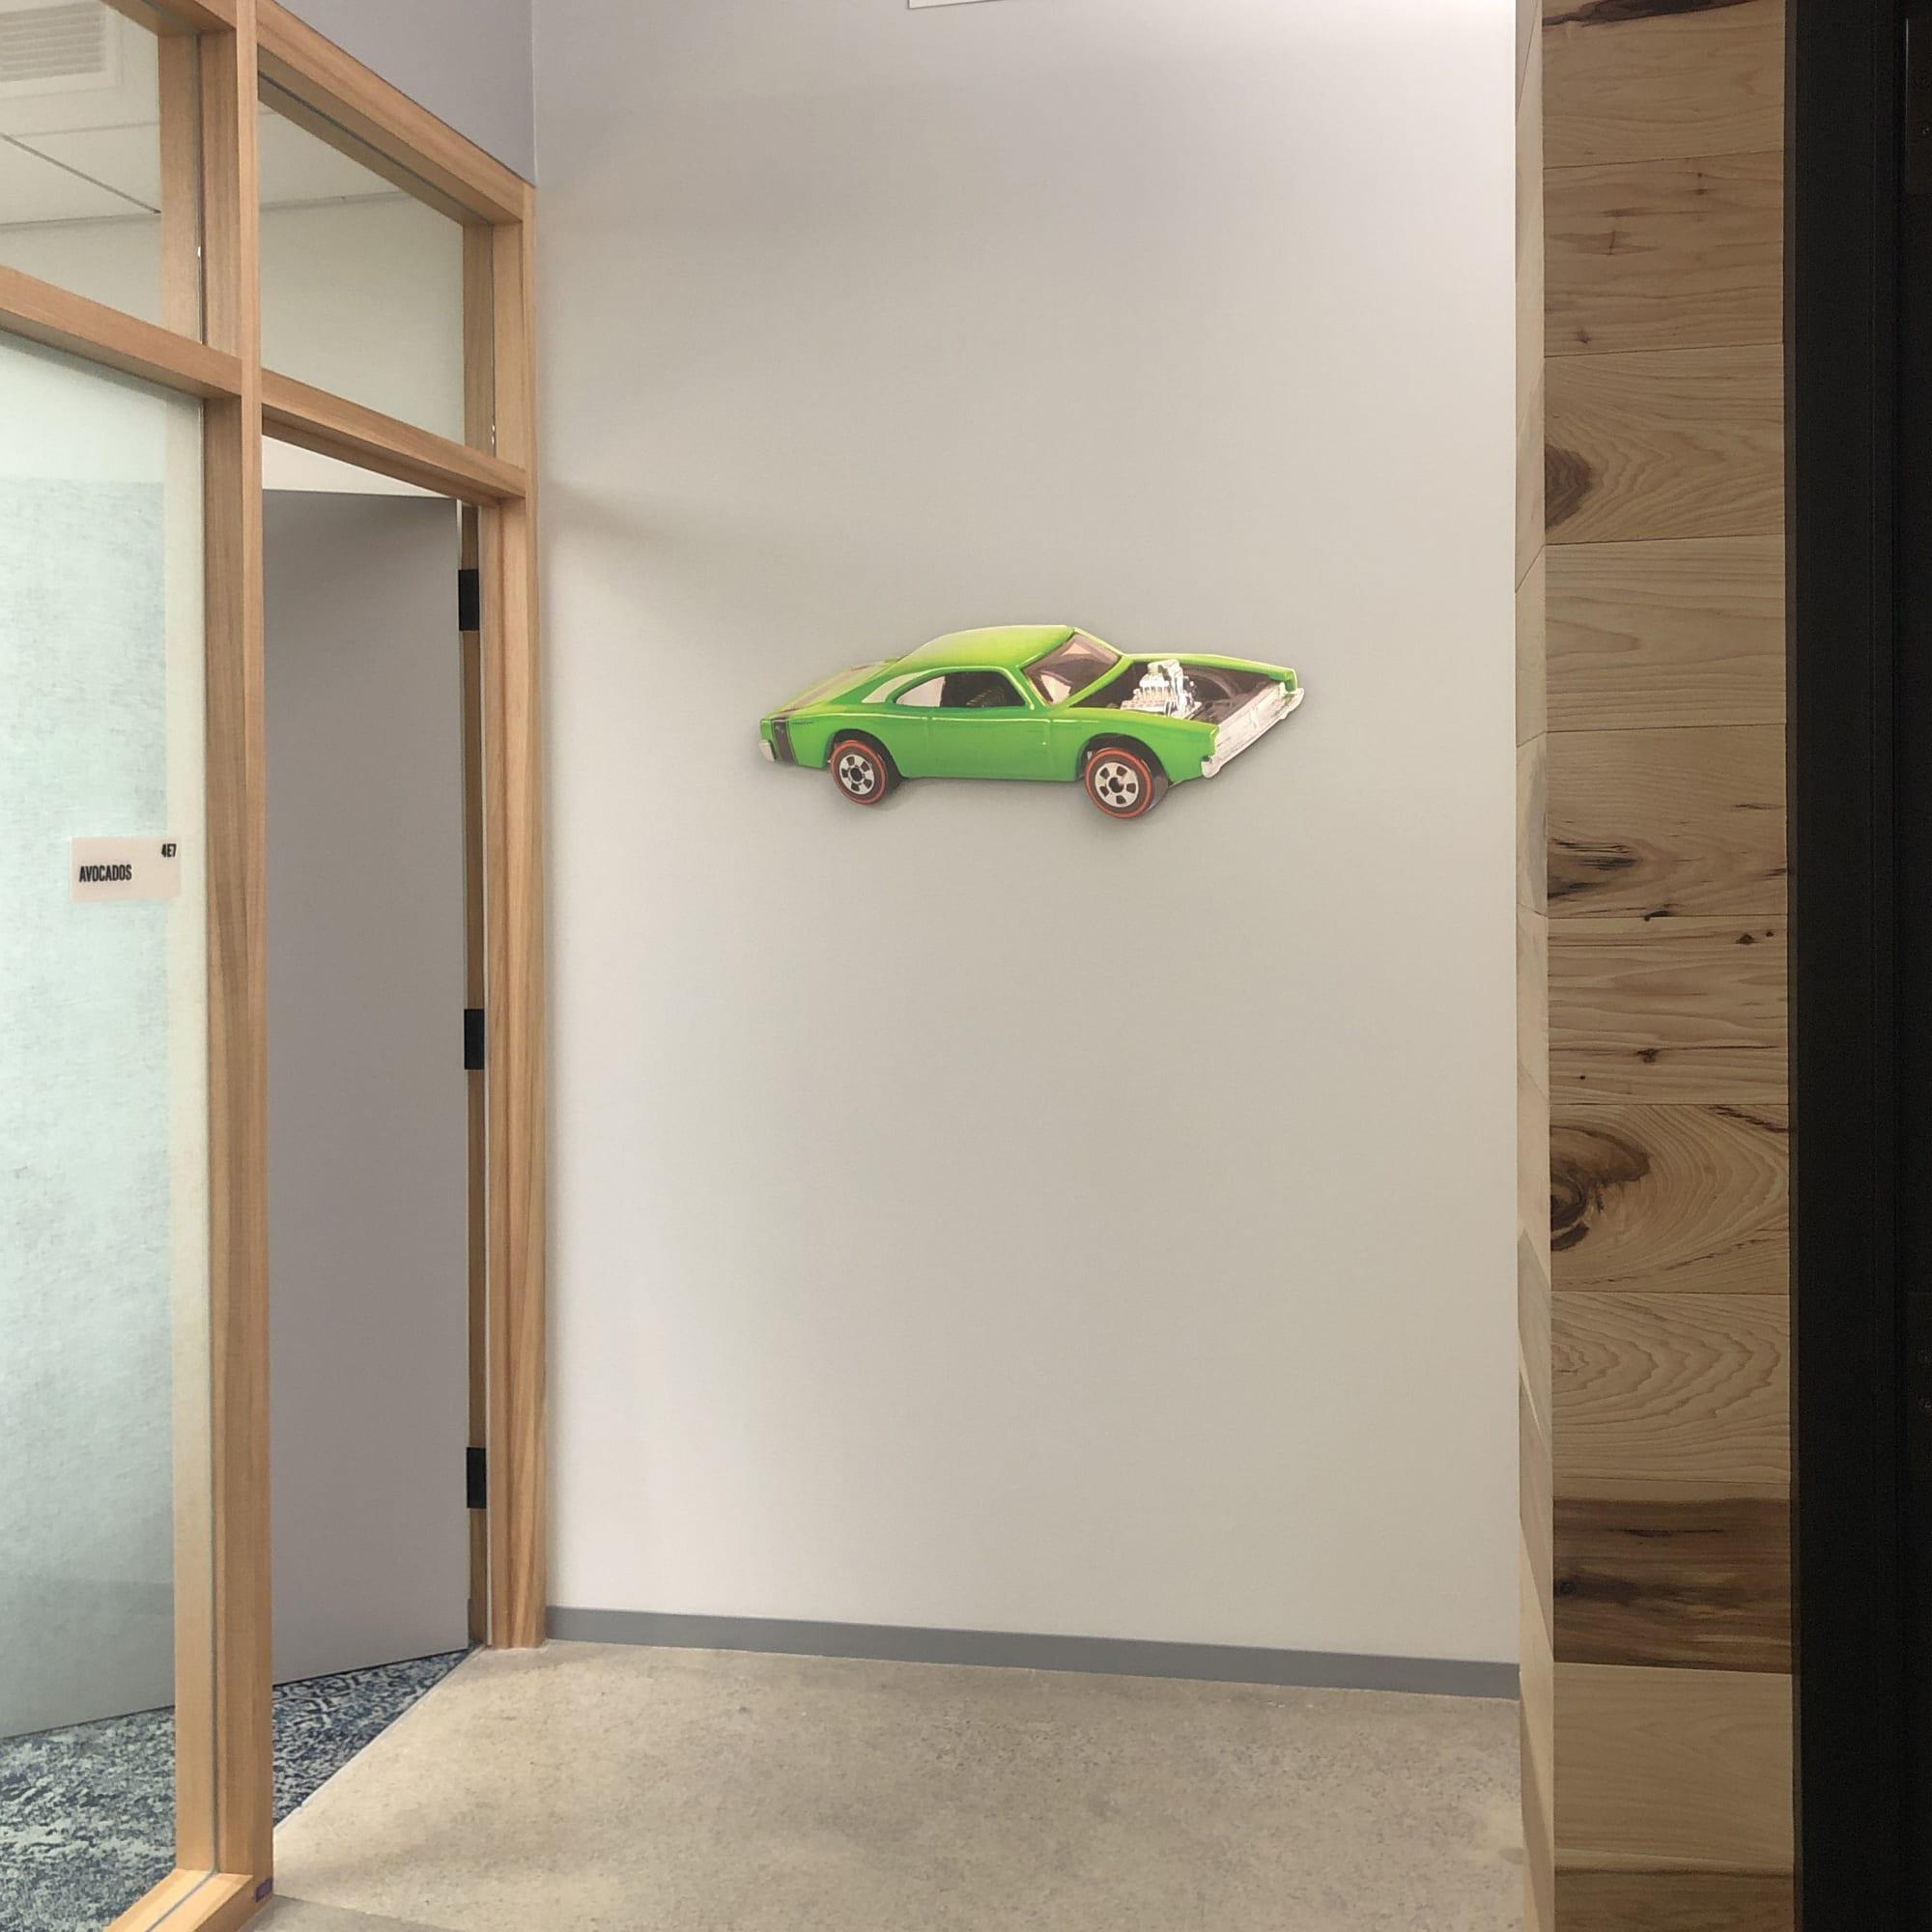 Art & Wall Decor by ANTLRE - Hannah Sitzer seen at Google RWC SEA6, Redwood City - Hot Wheels